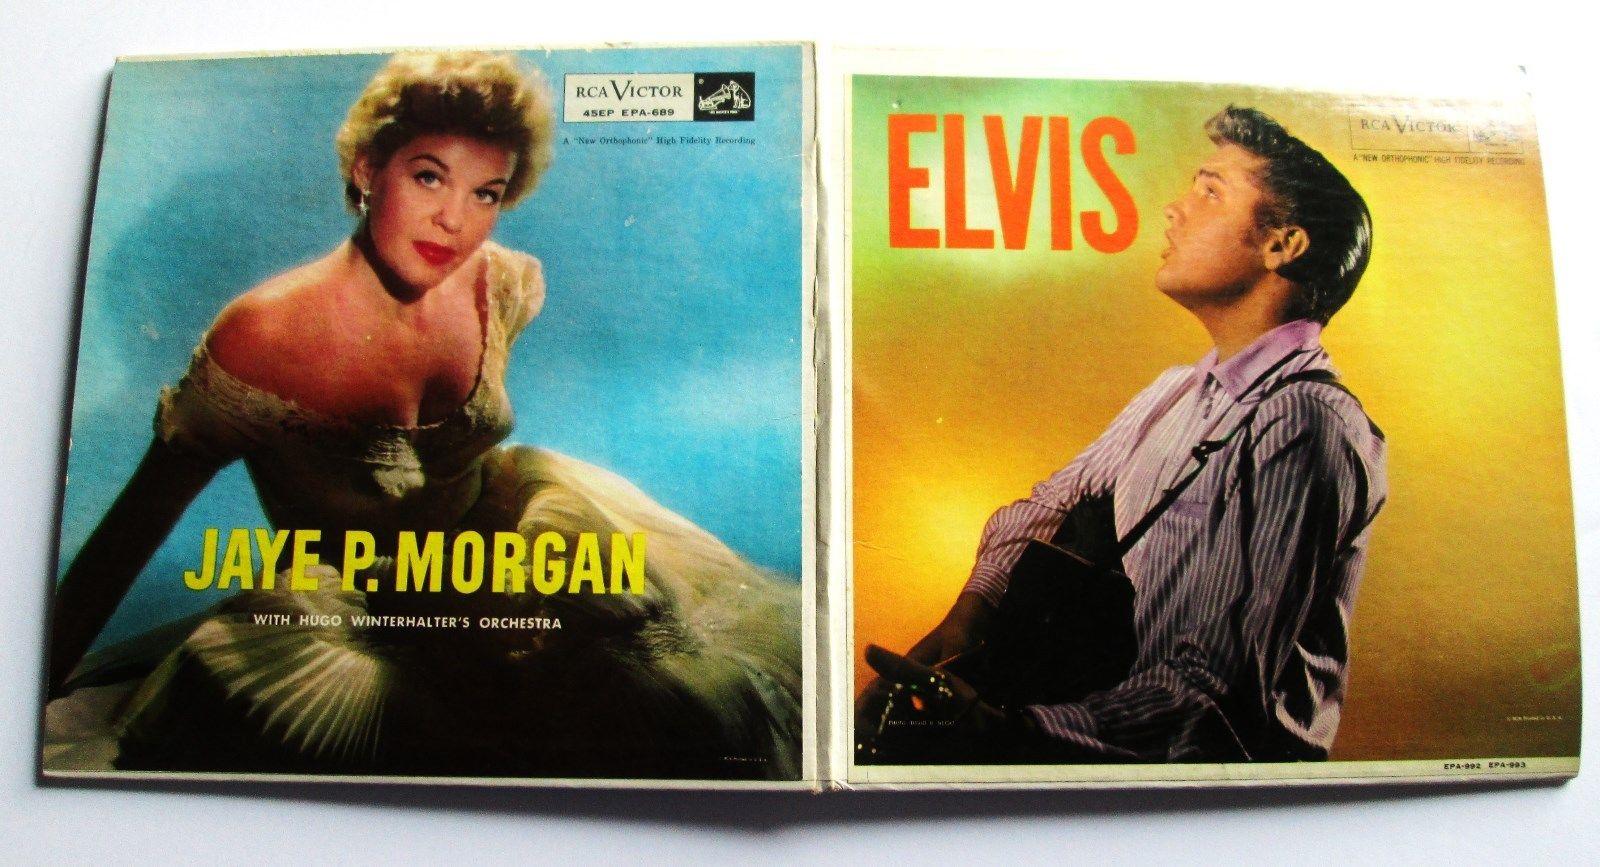 '56 Elvis Presley / Jaye P Morgan EP RCA-EPA-992/689 Promo Sampler RARE Original